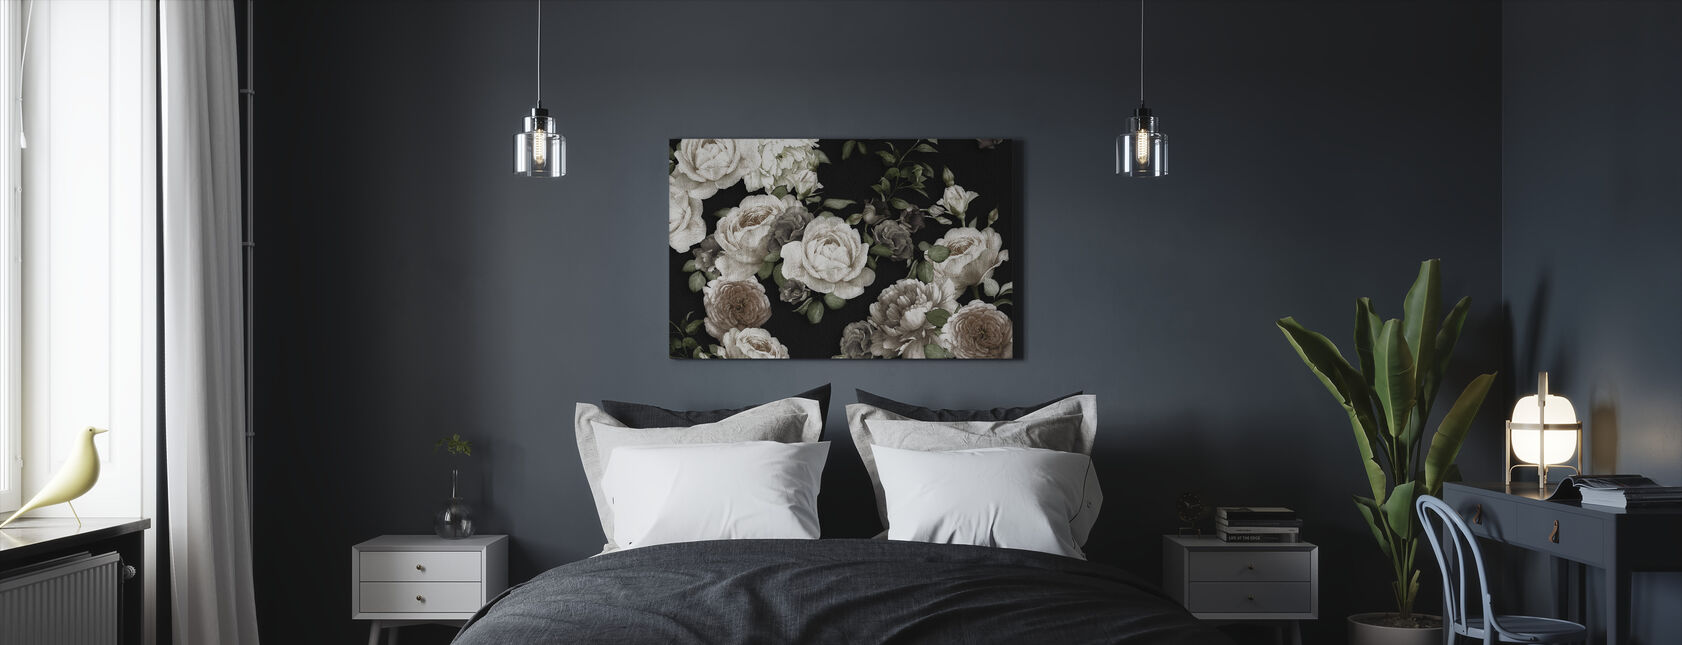 White Roses on Black Background - Canvas print - Bedroom